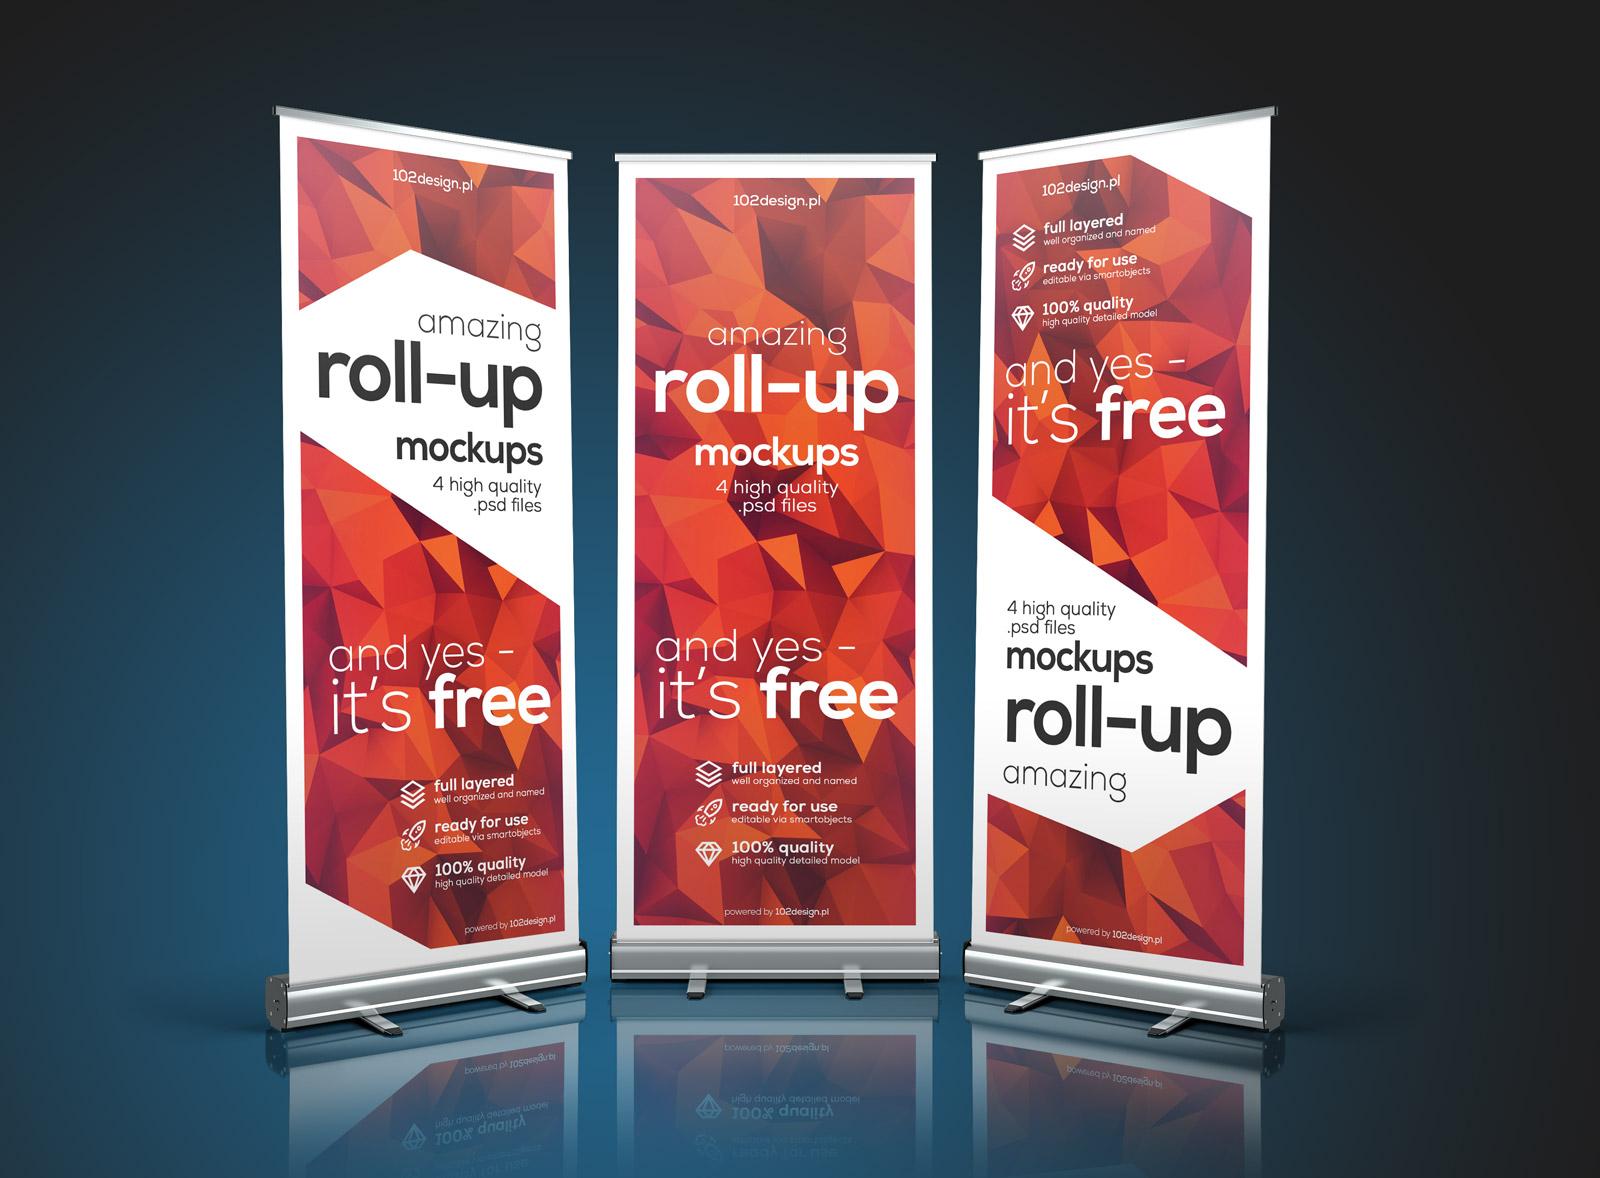 Free-Premuim-Roll-up-Banner-Stand-Mockup-PSD